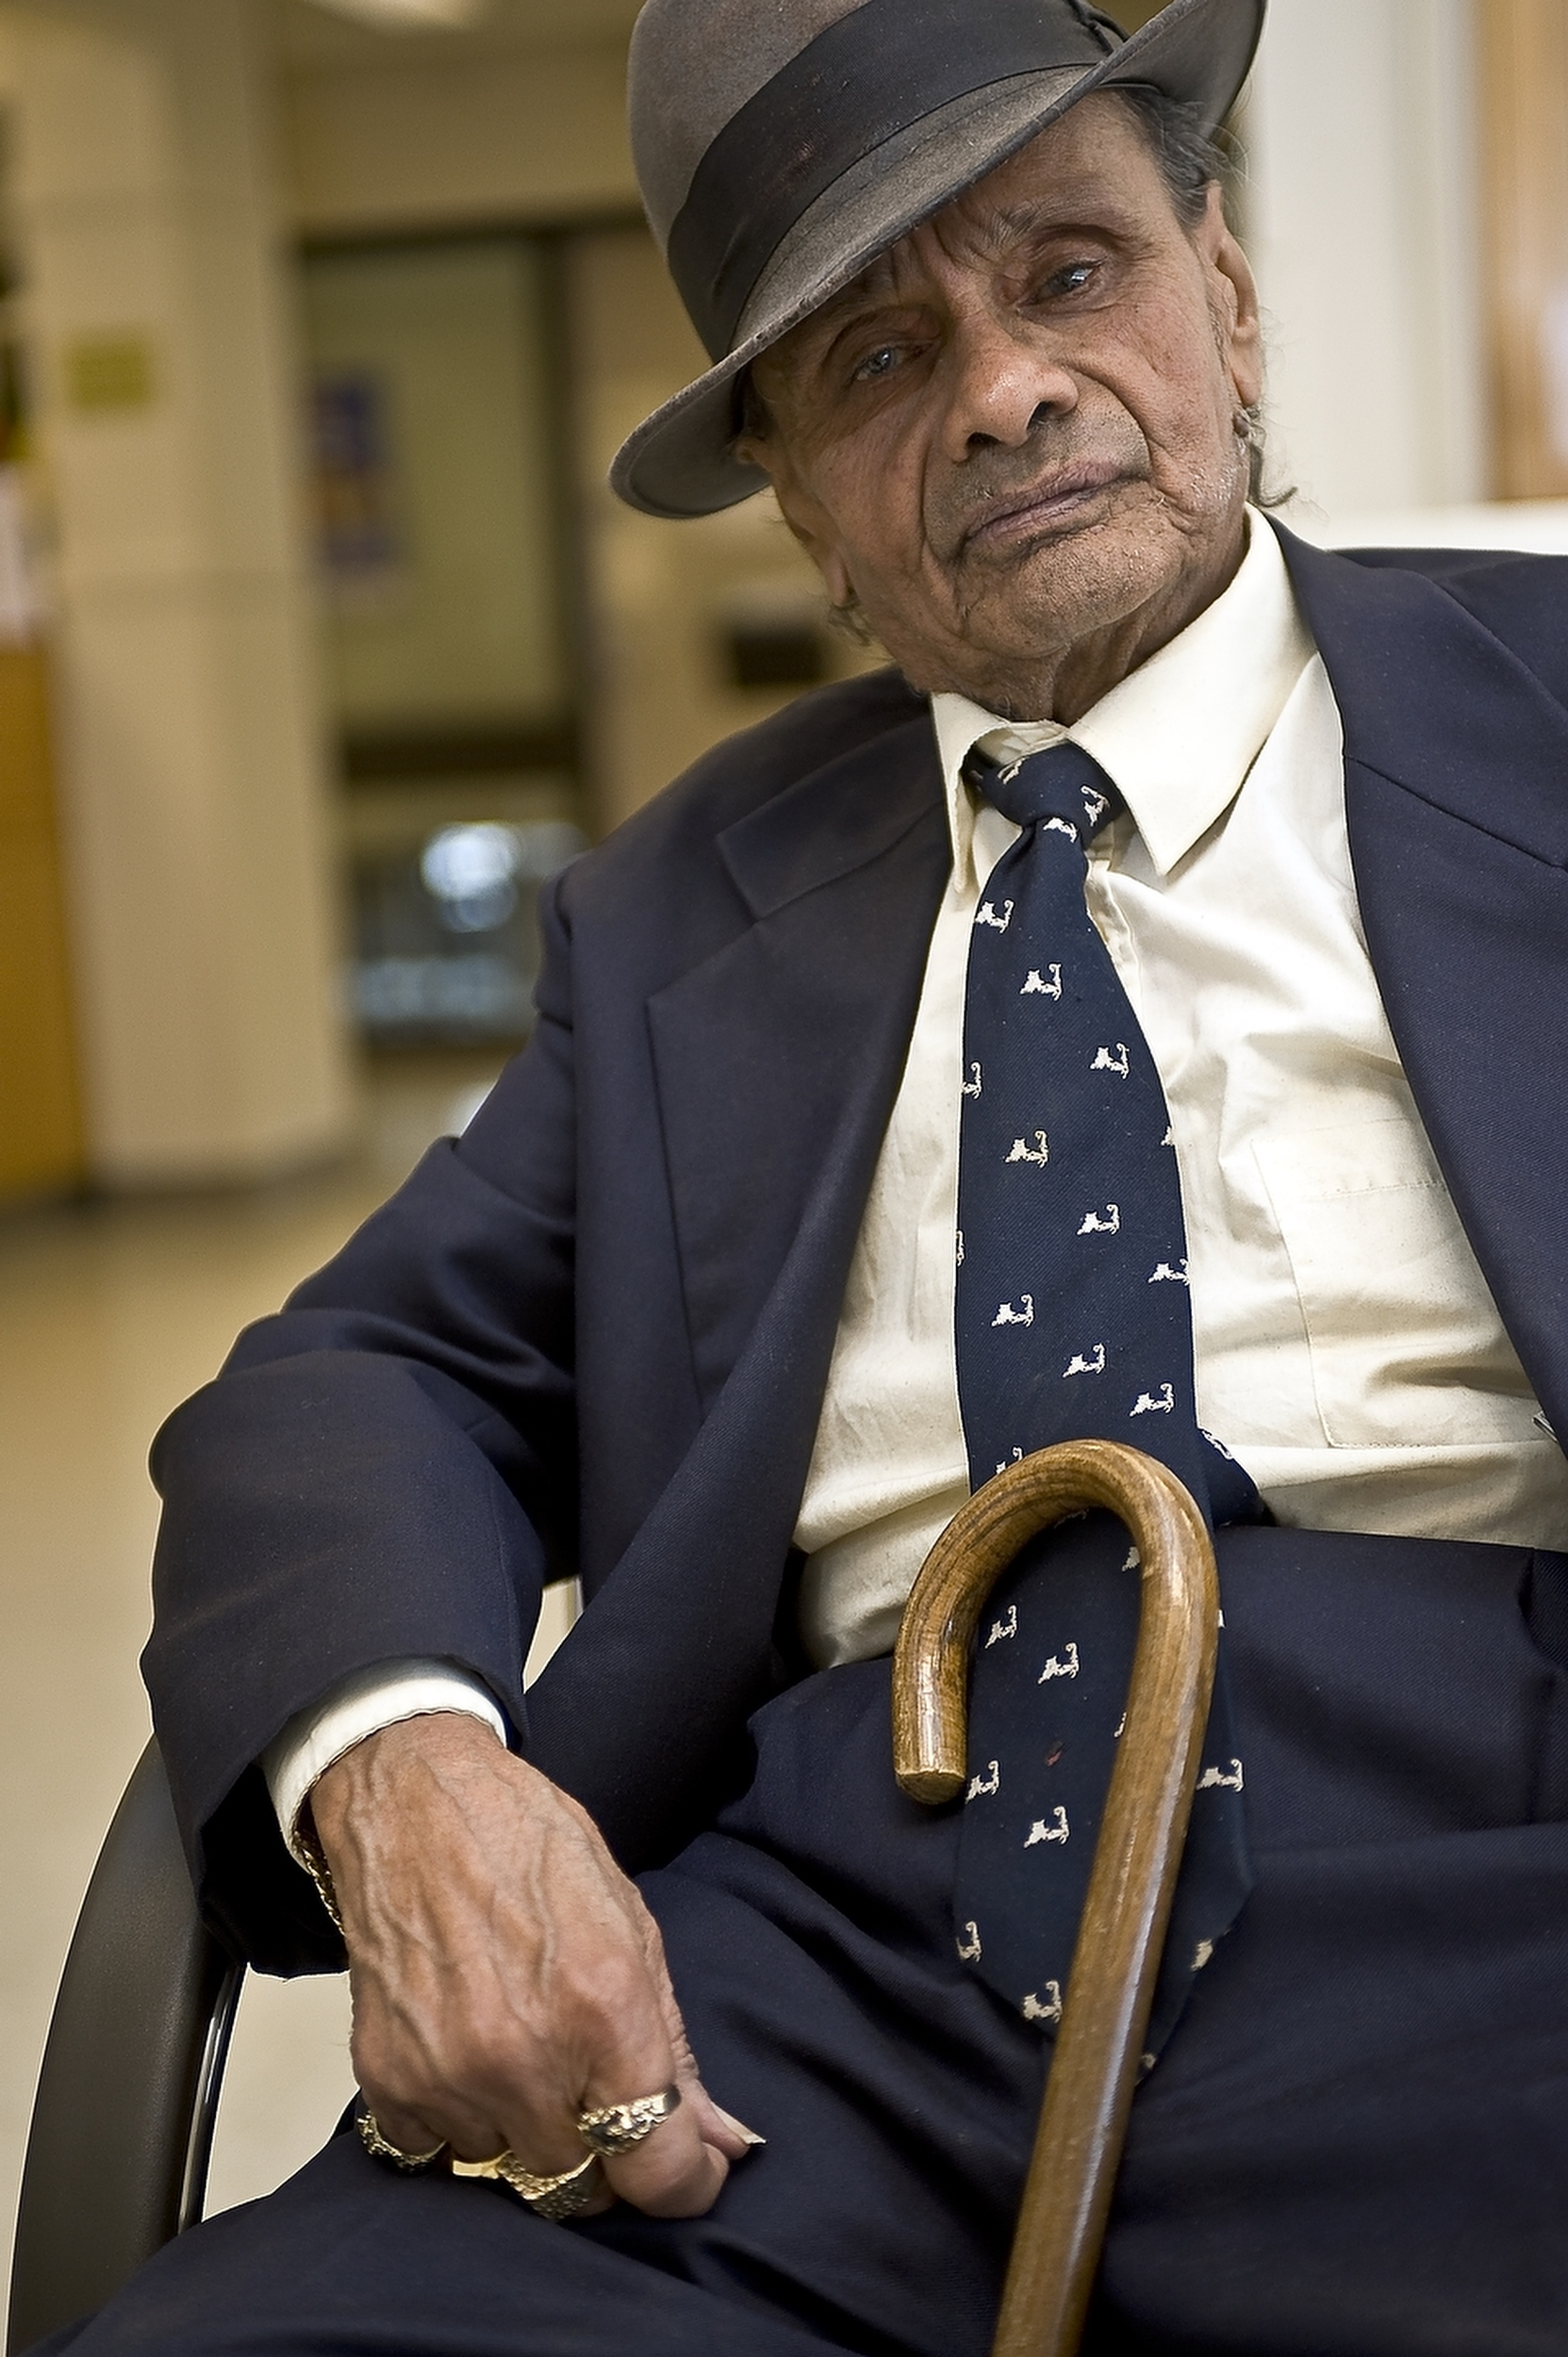 Man visiting hospital